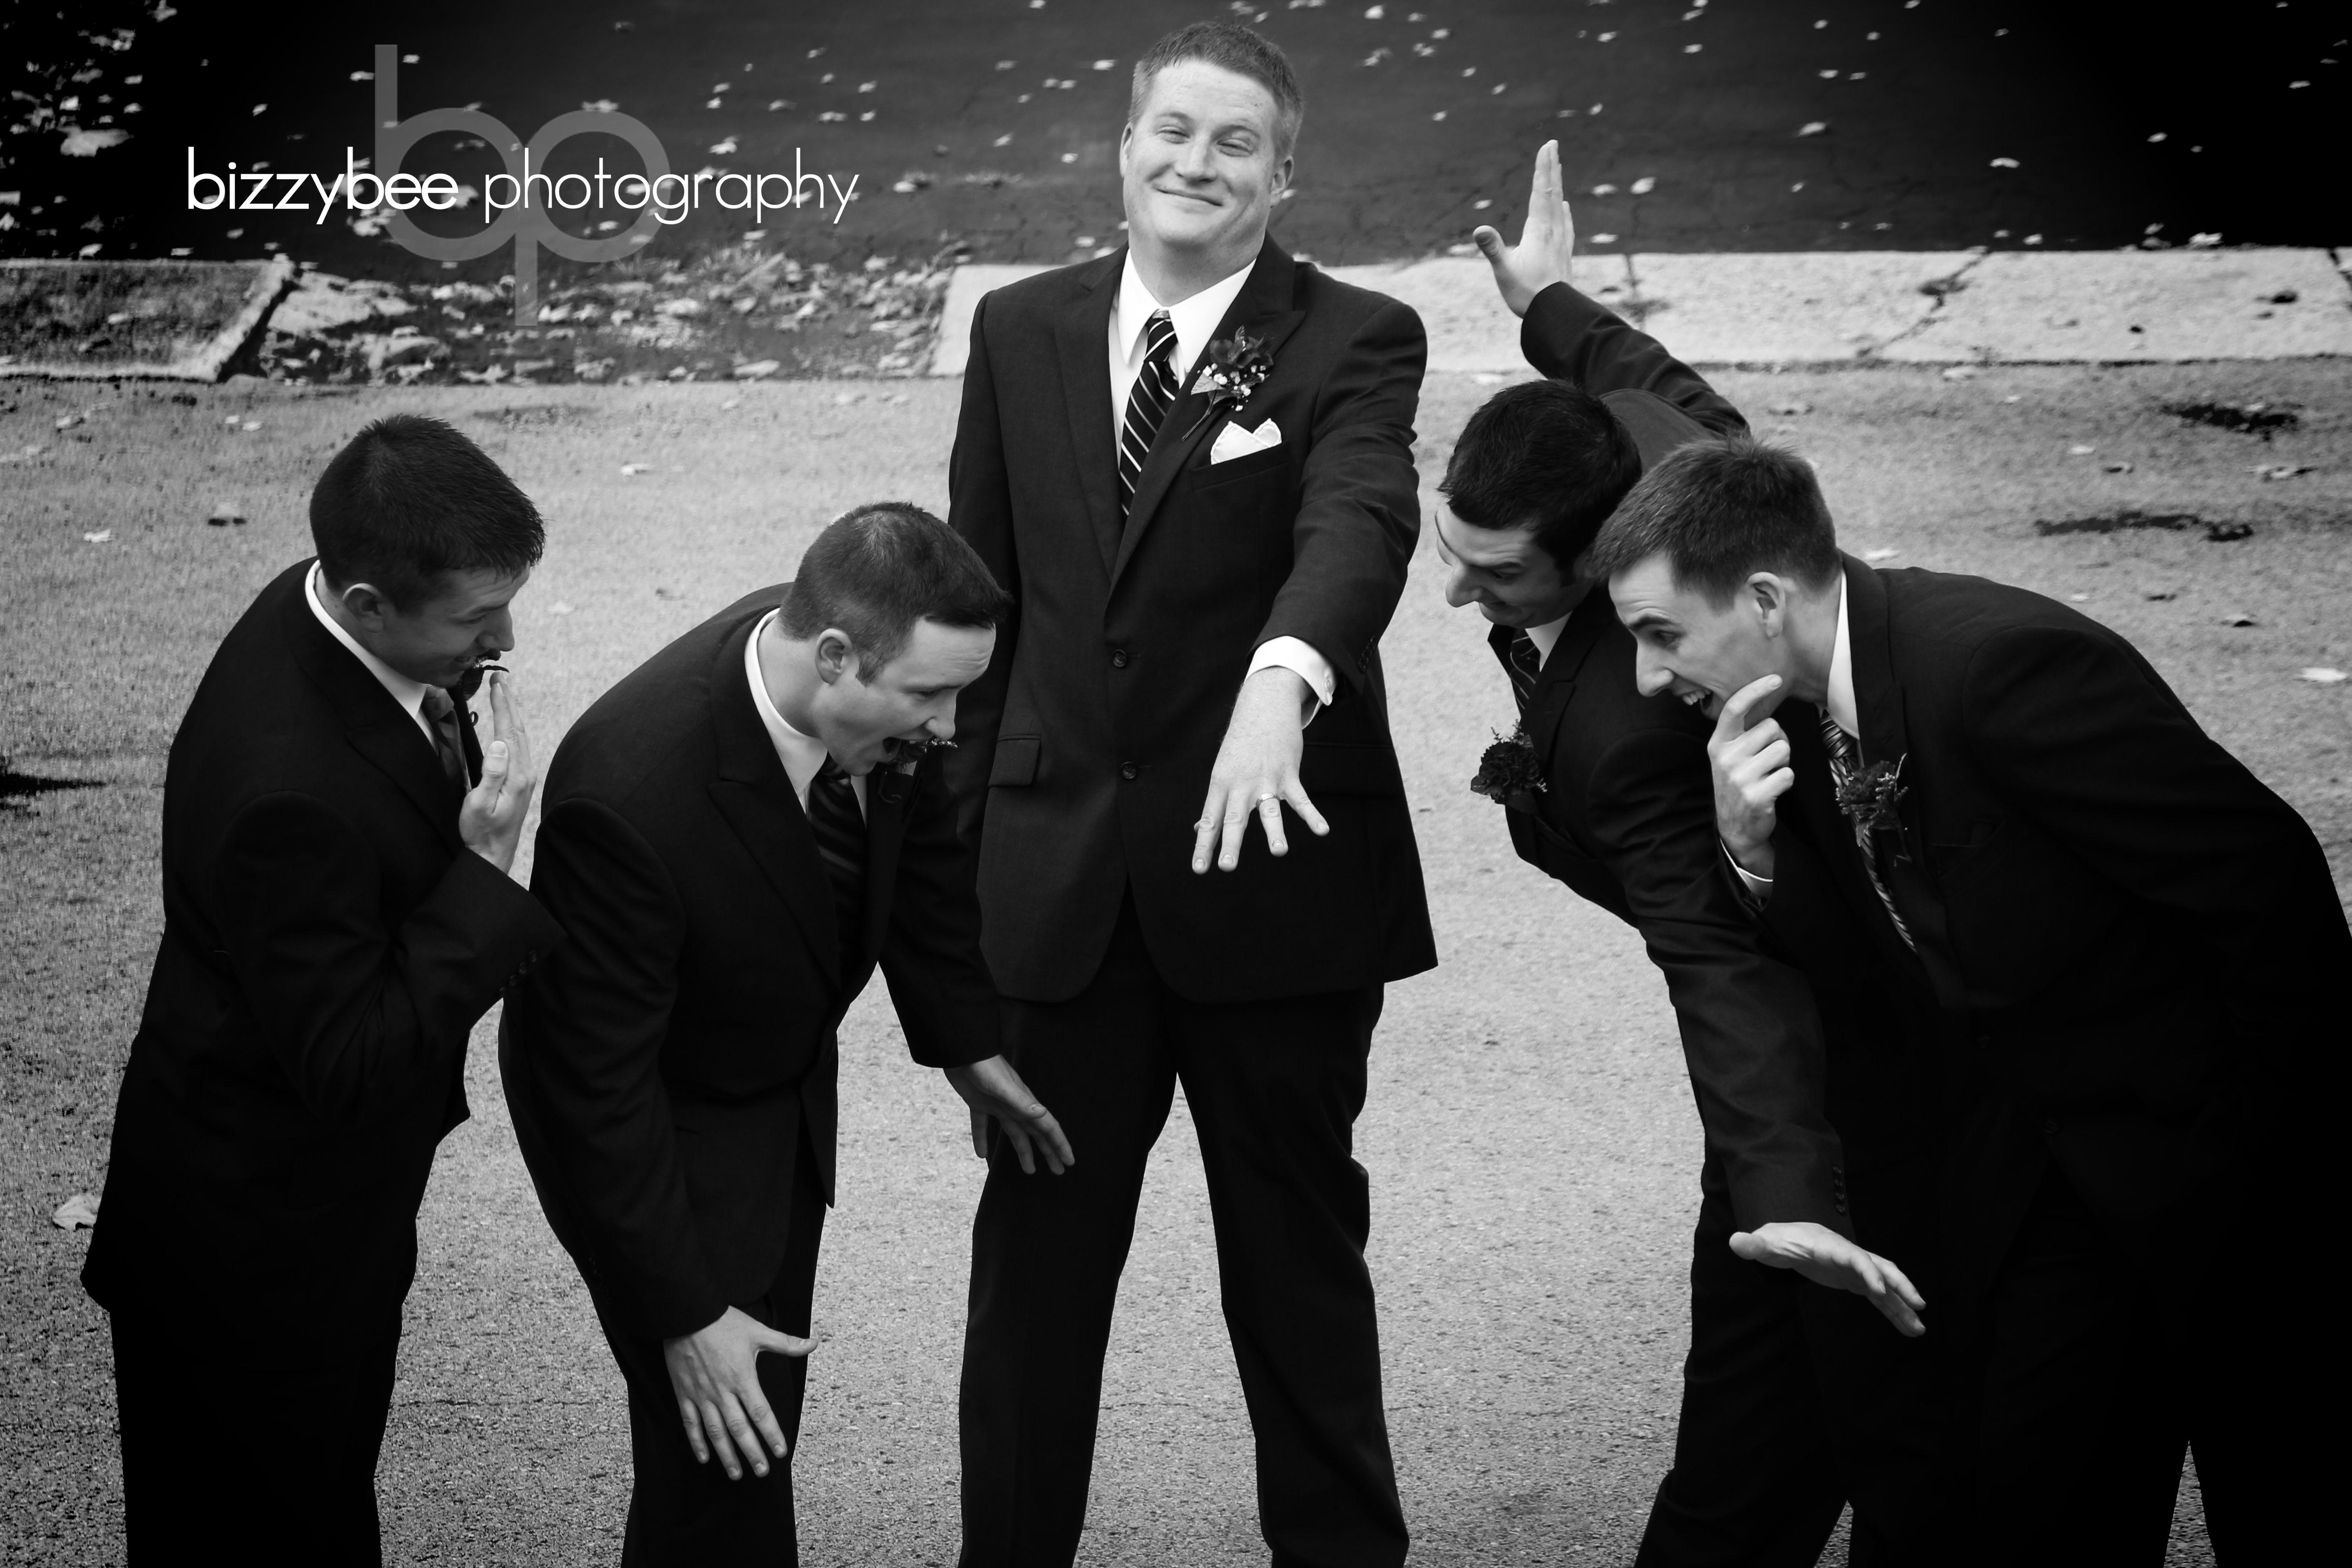 www bizzybeephotography com wedding photography funny groomsmen pose